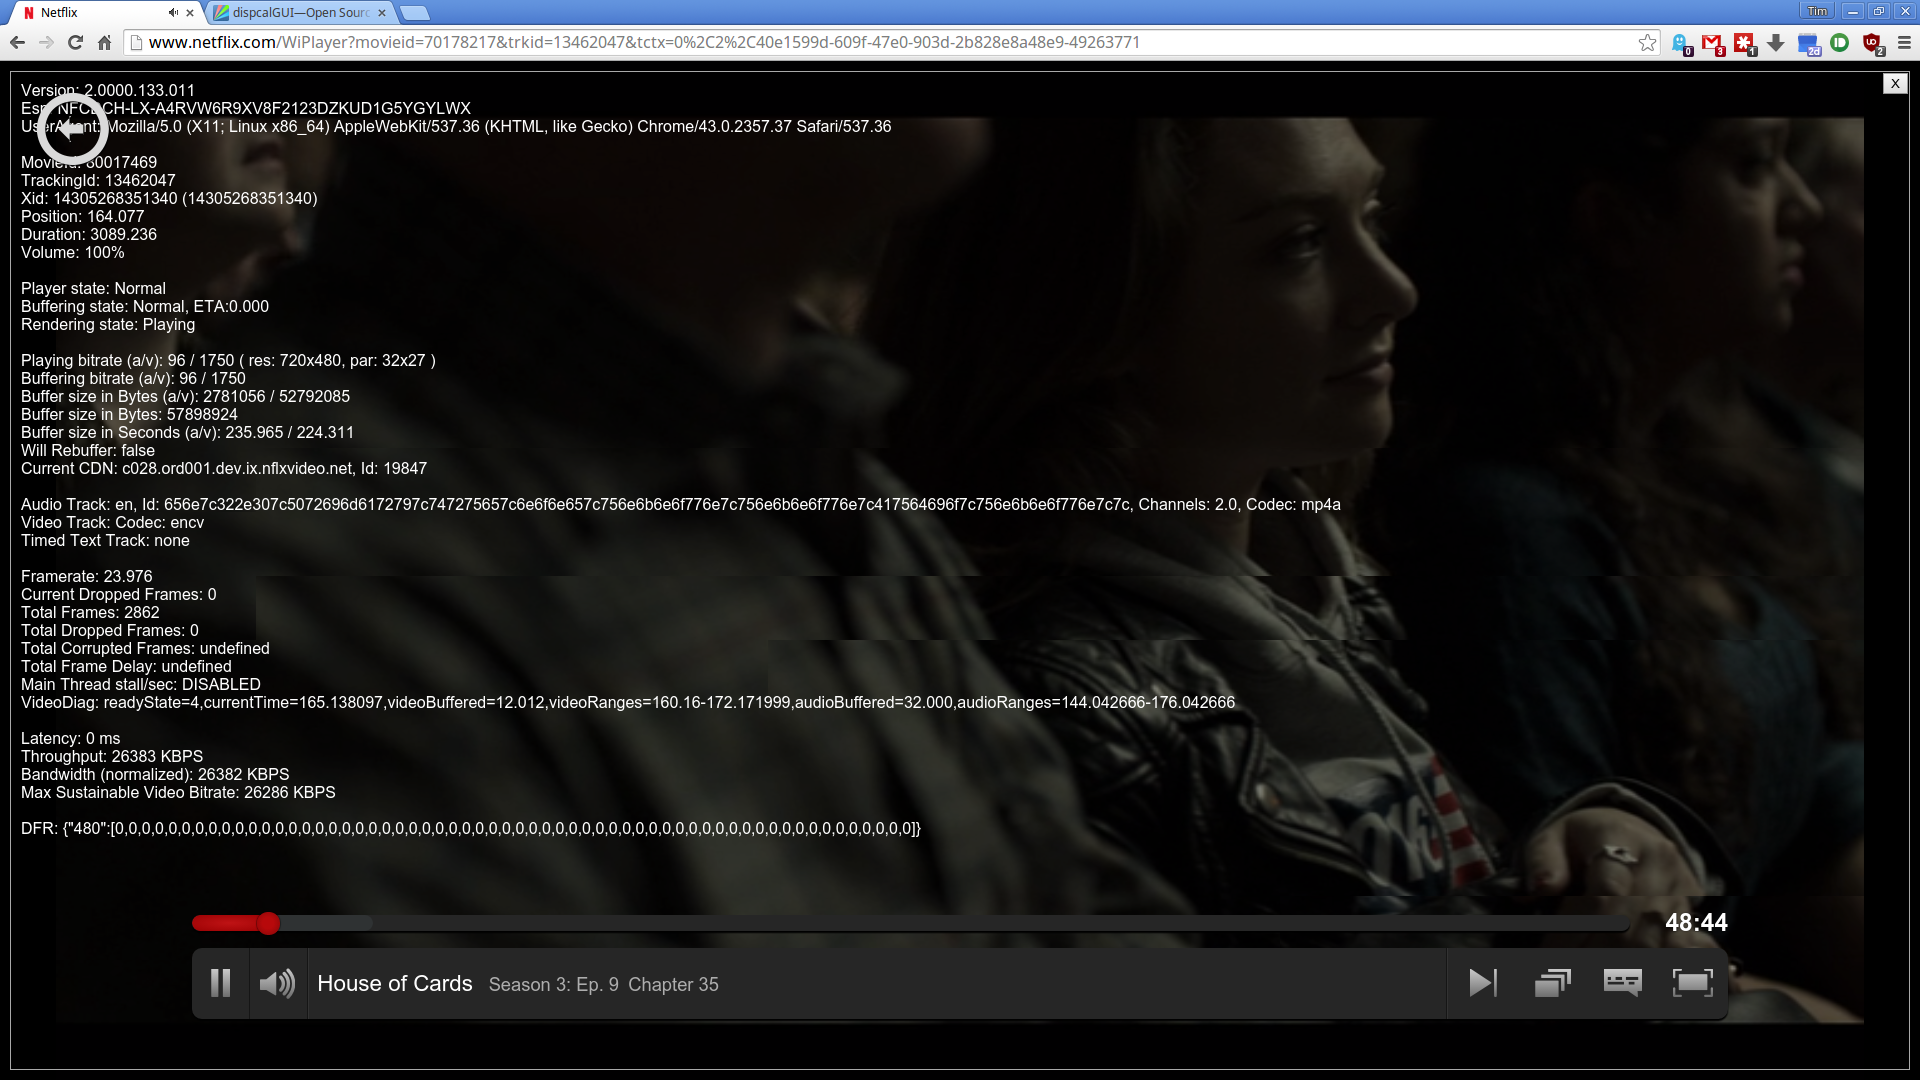 Any reason why Chrome can't stream Netflix at 1080p? - Google Chrome